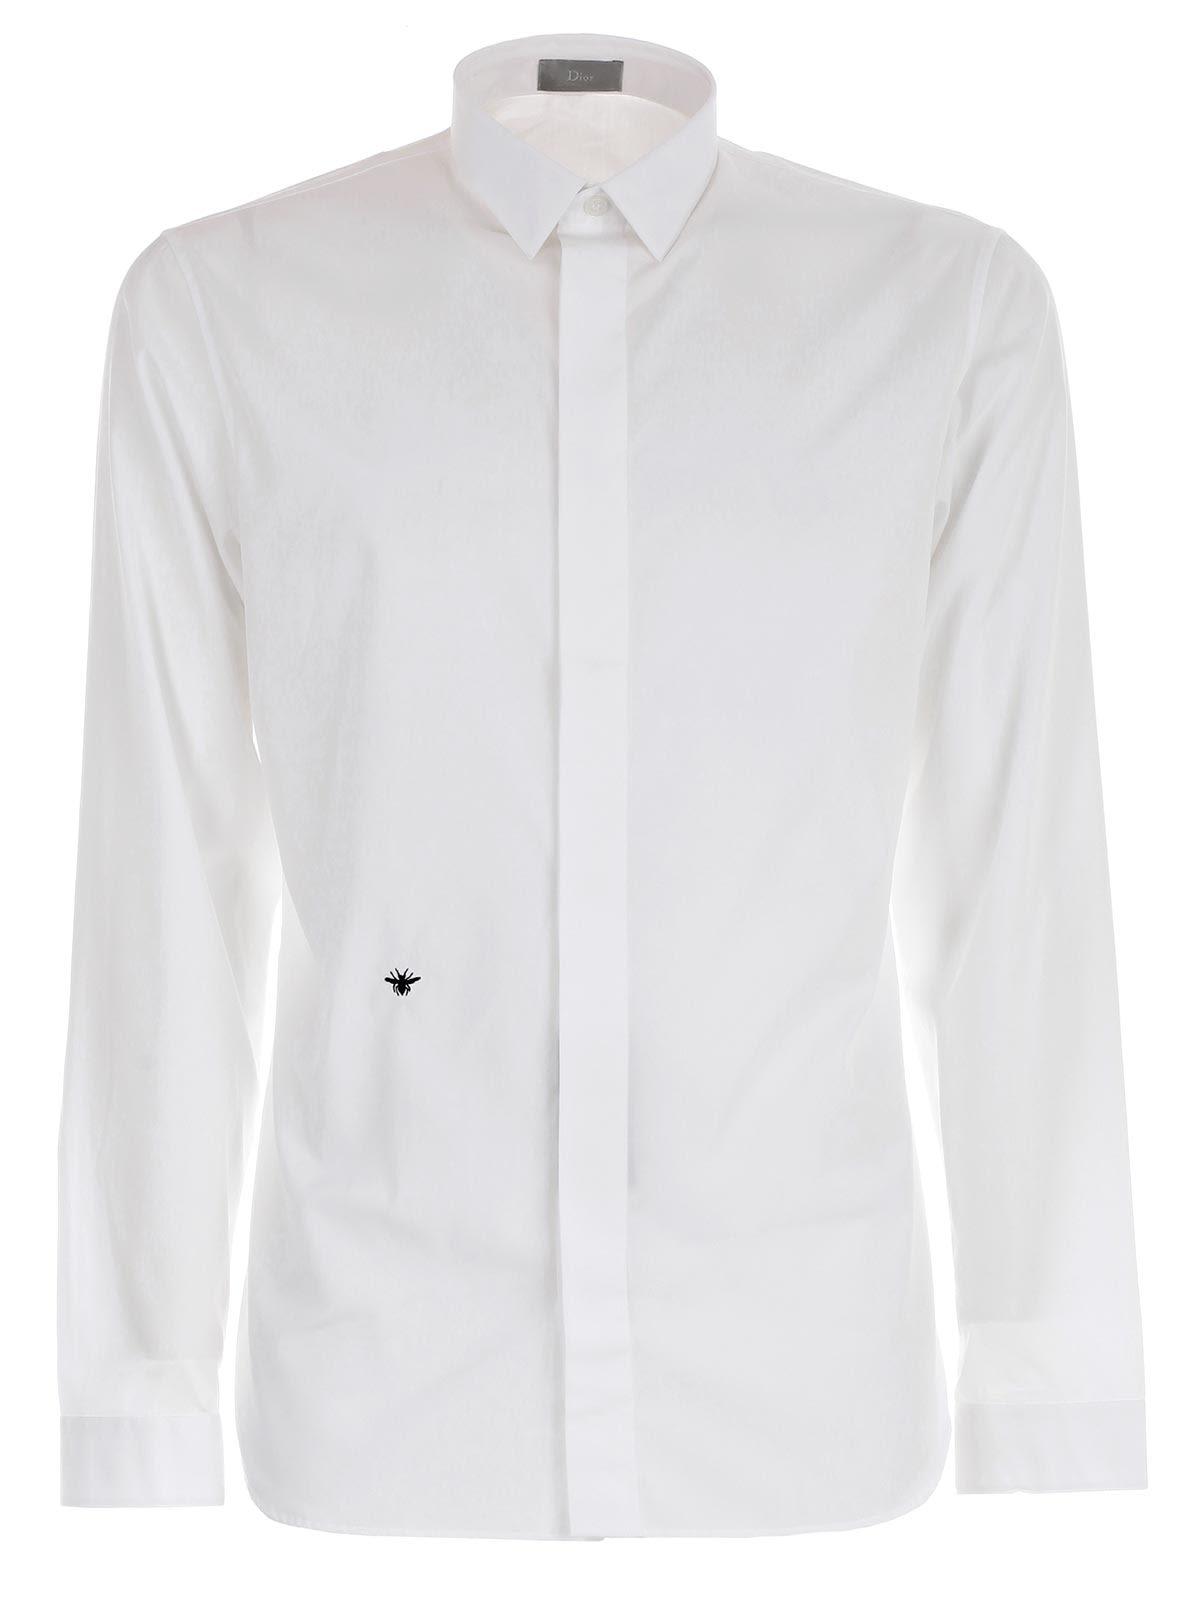 Dior Homme Shirt